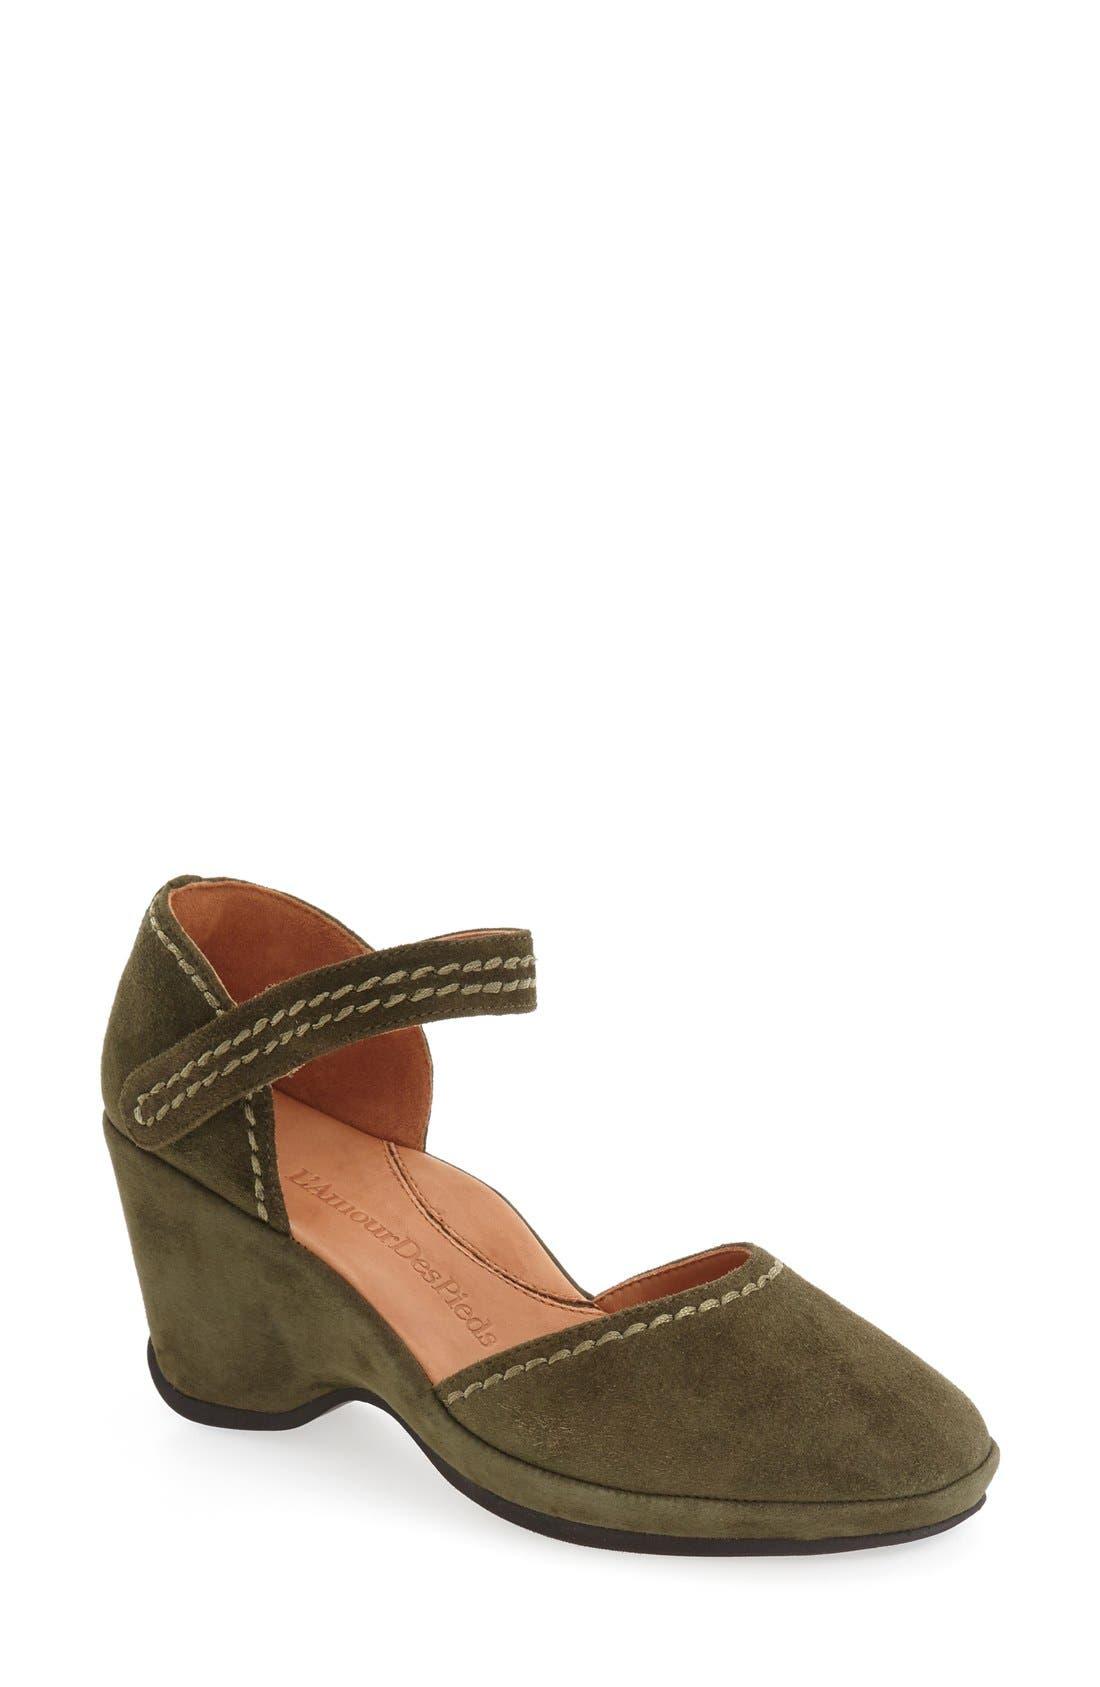 Main Image - L'Amourdes Pieds'Orva' Wedge Sandal (Women)